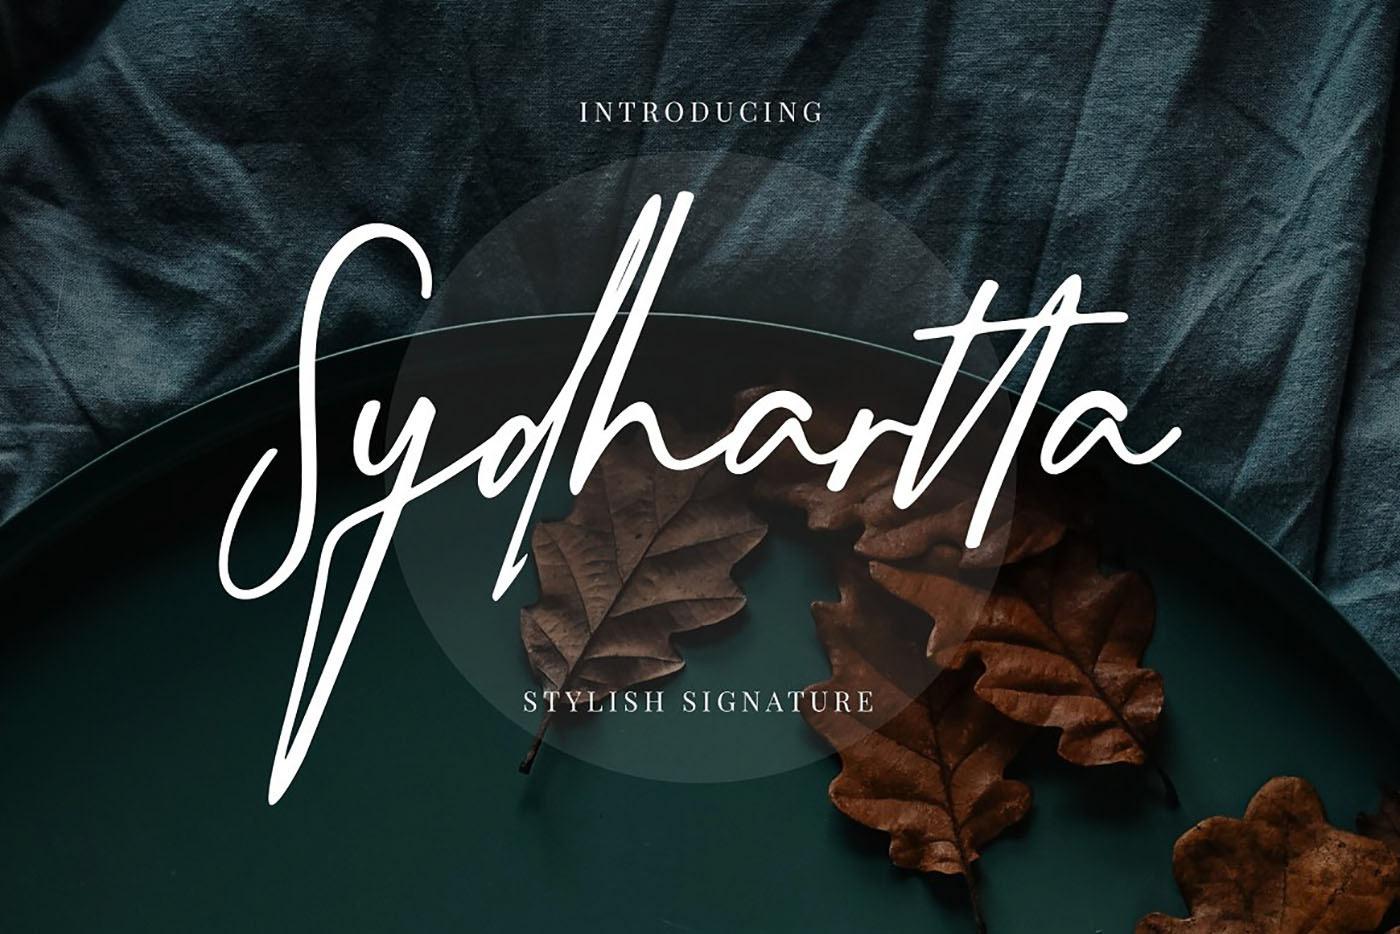 Sydhartta Free Font - script